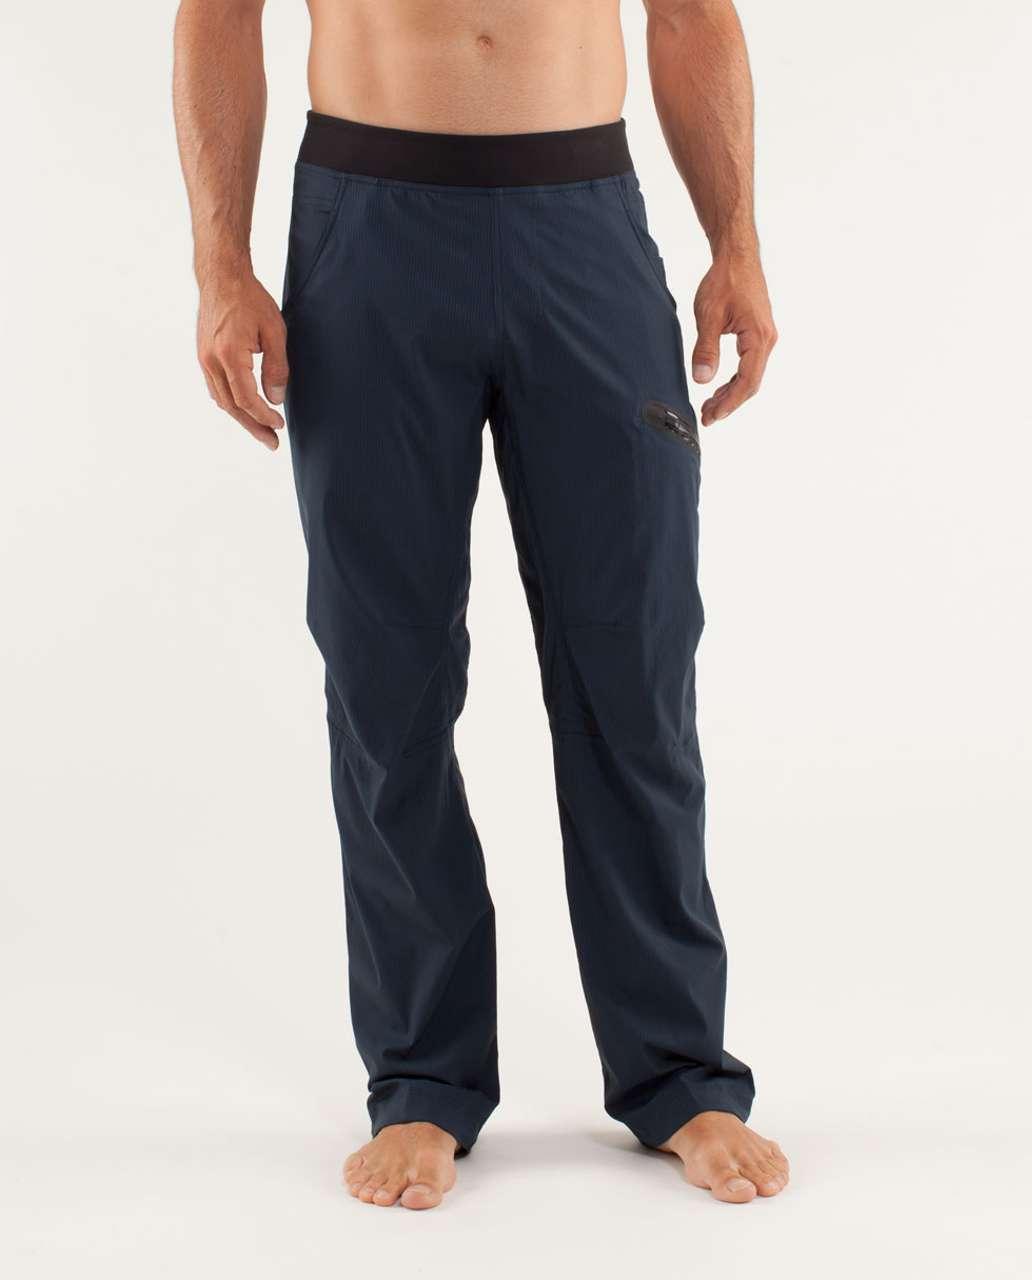 a4c247503 Lululemon Seawall Track Pant  Lined - Black Iris Blue - lulu fanatics